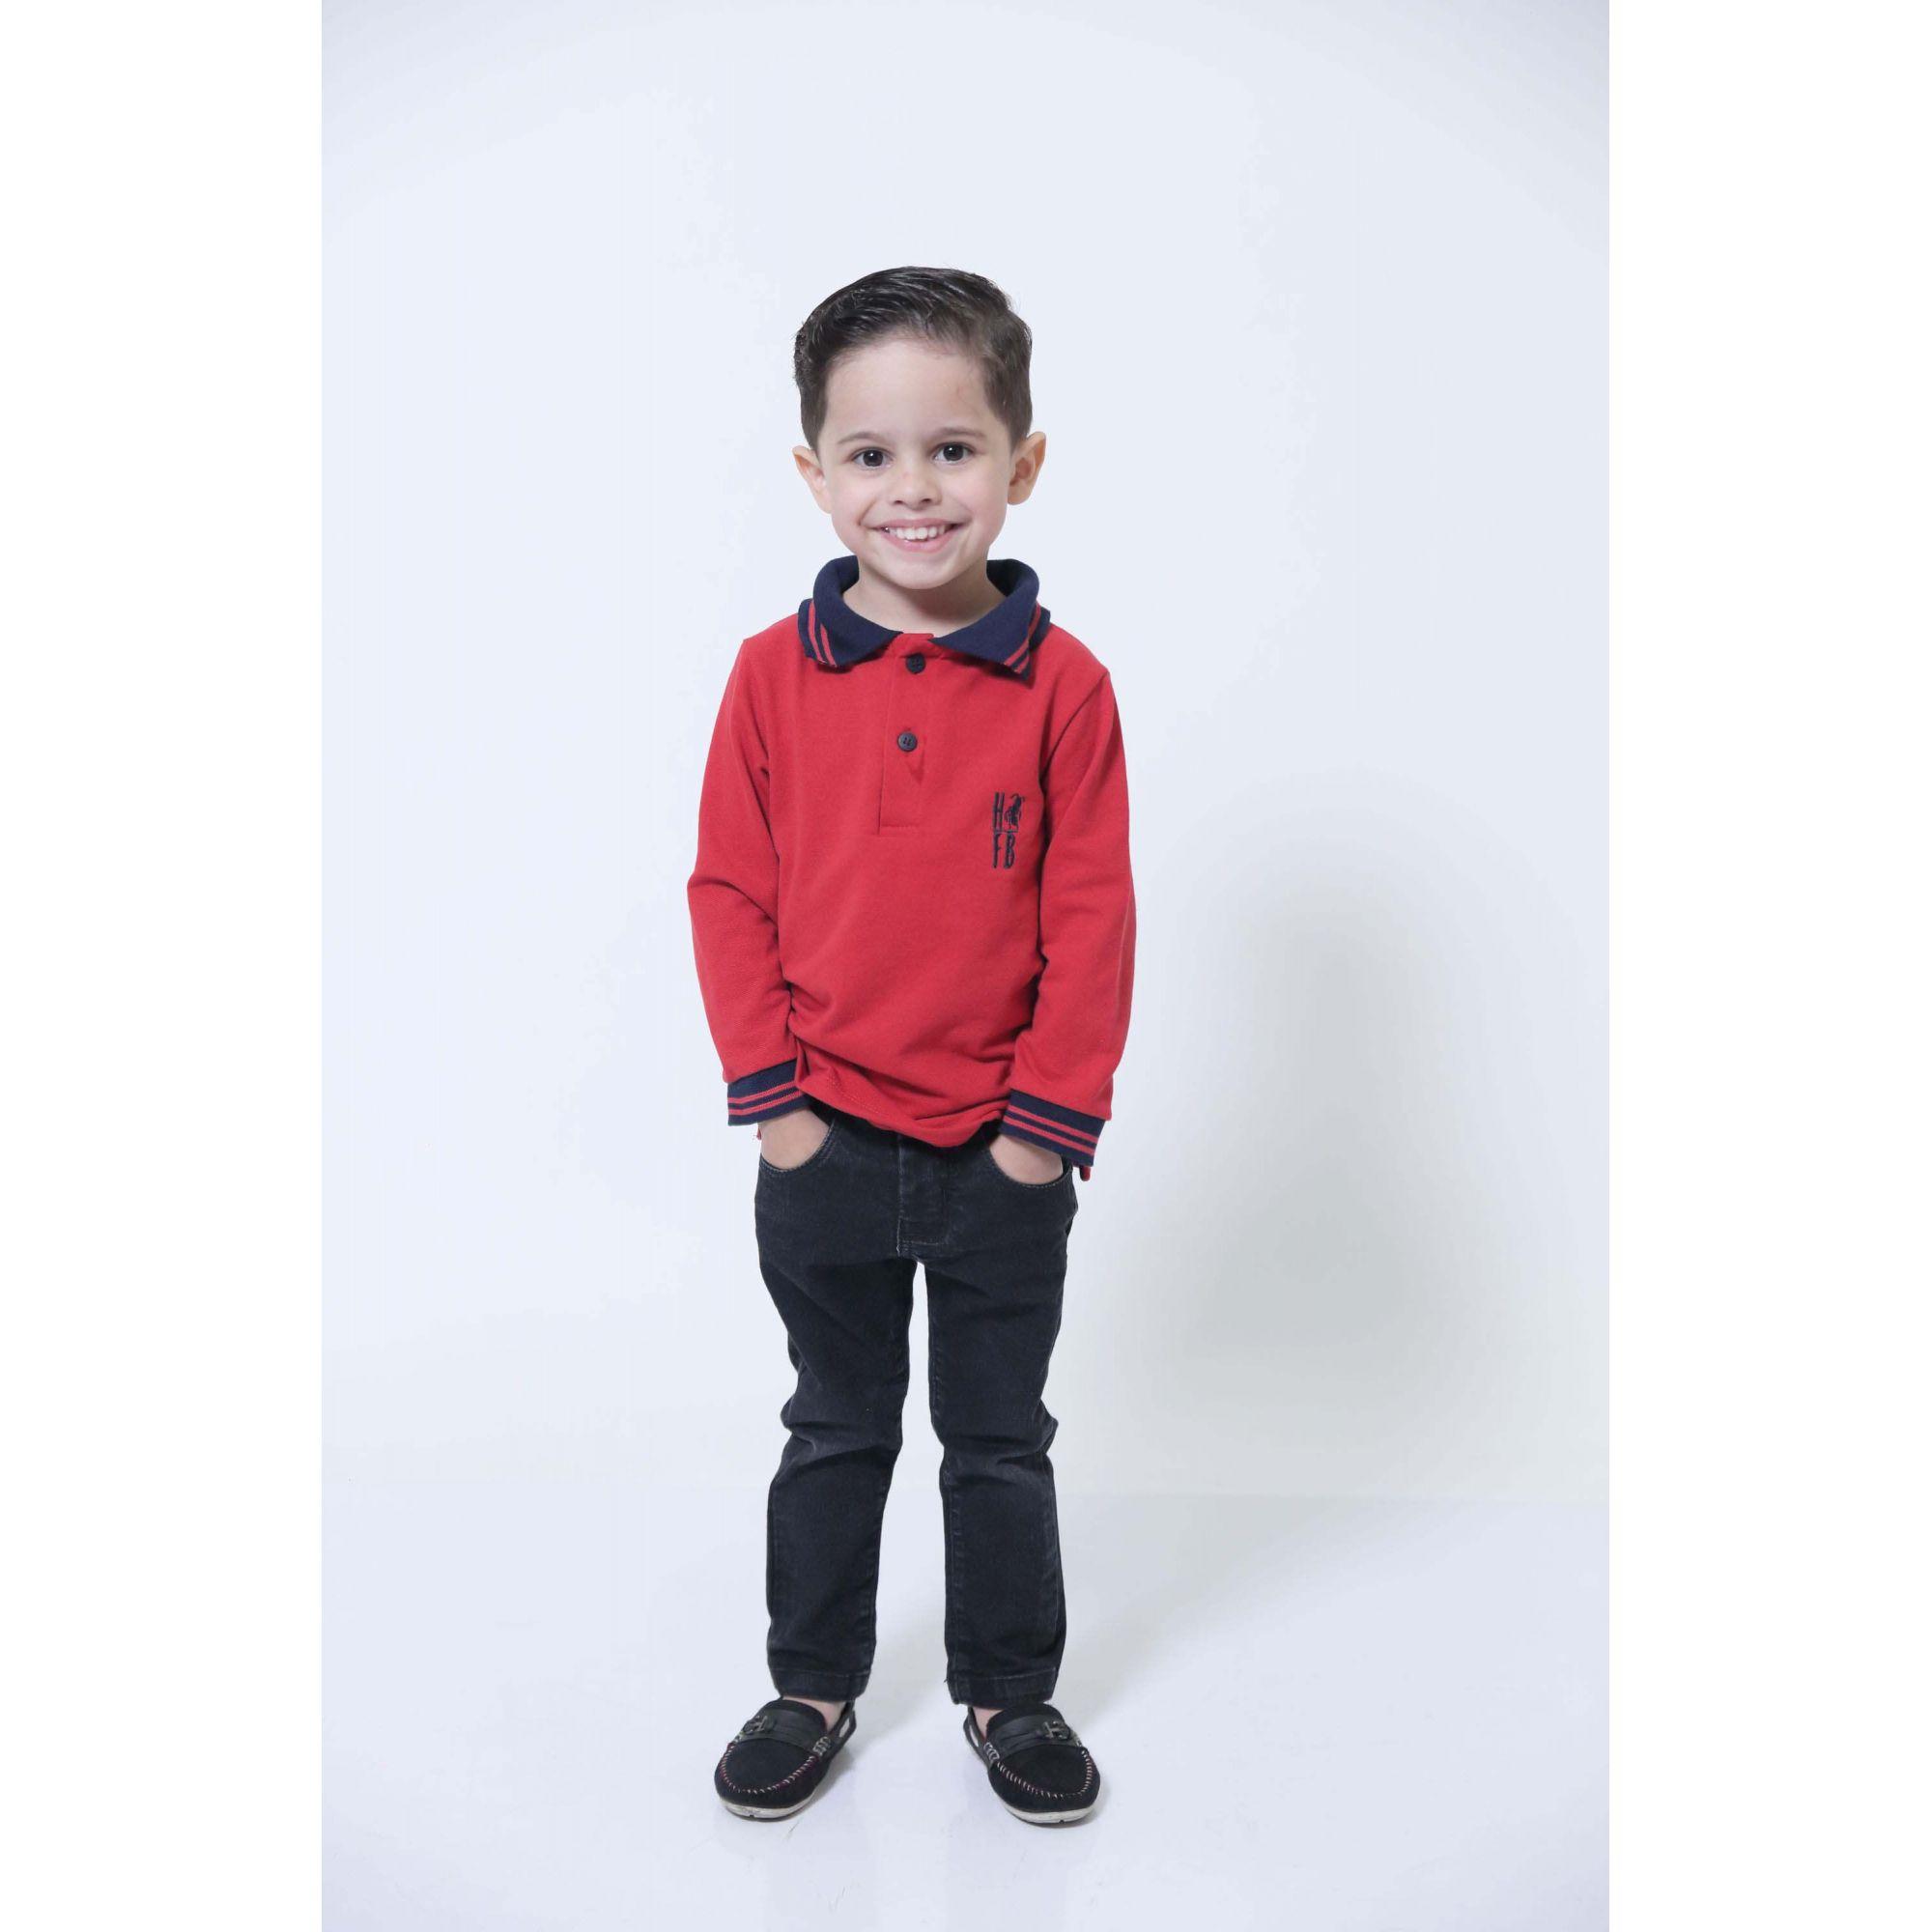 Camisa Polo ou Body Infantil Vermelho Manga Longa  - Heitor Fashion Brazil